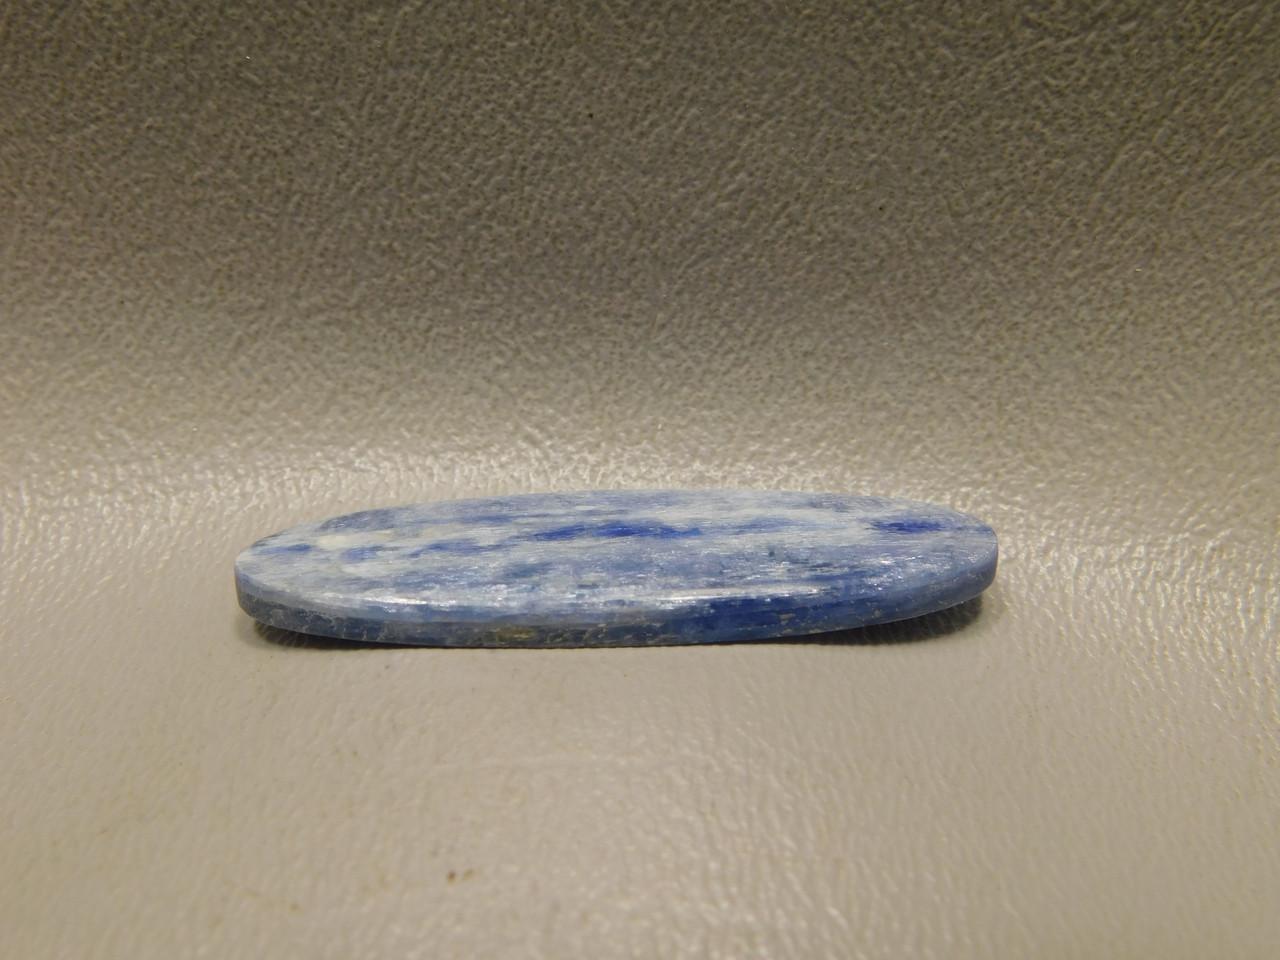 Blue Kyanite Jewelry Design Loose Stone Cabochon #12